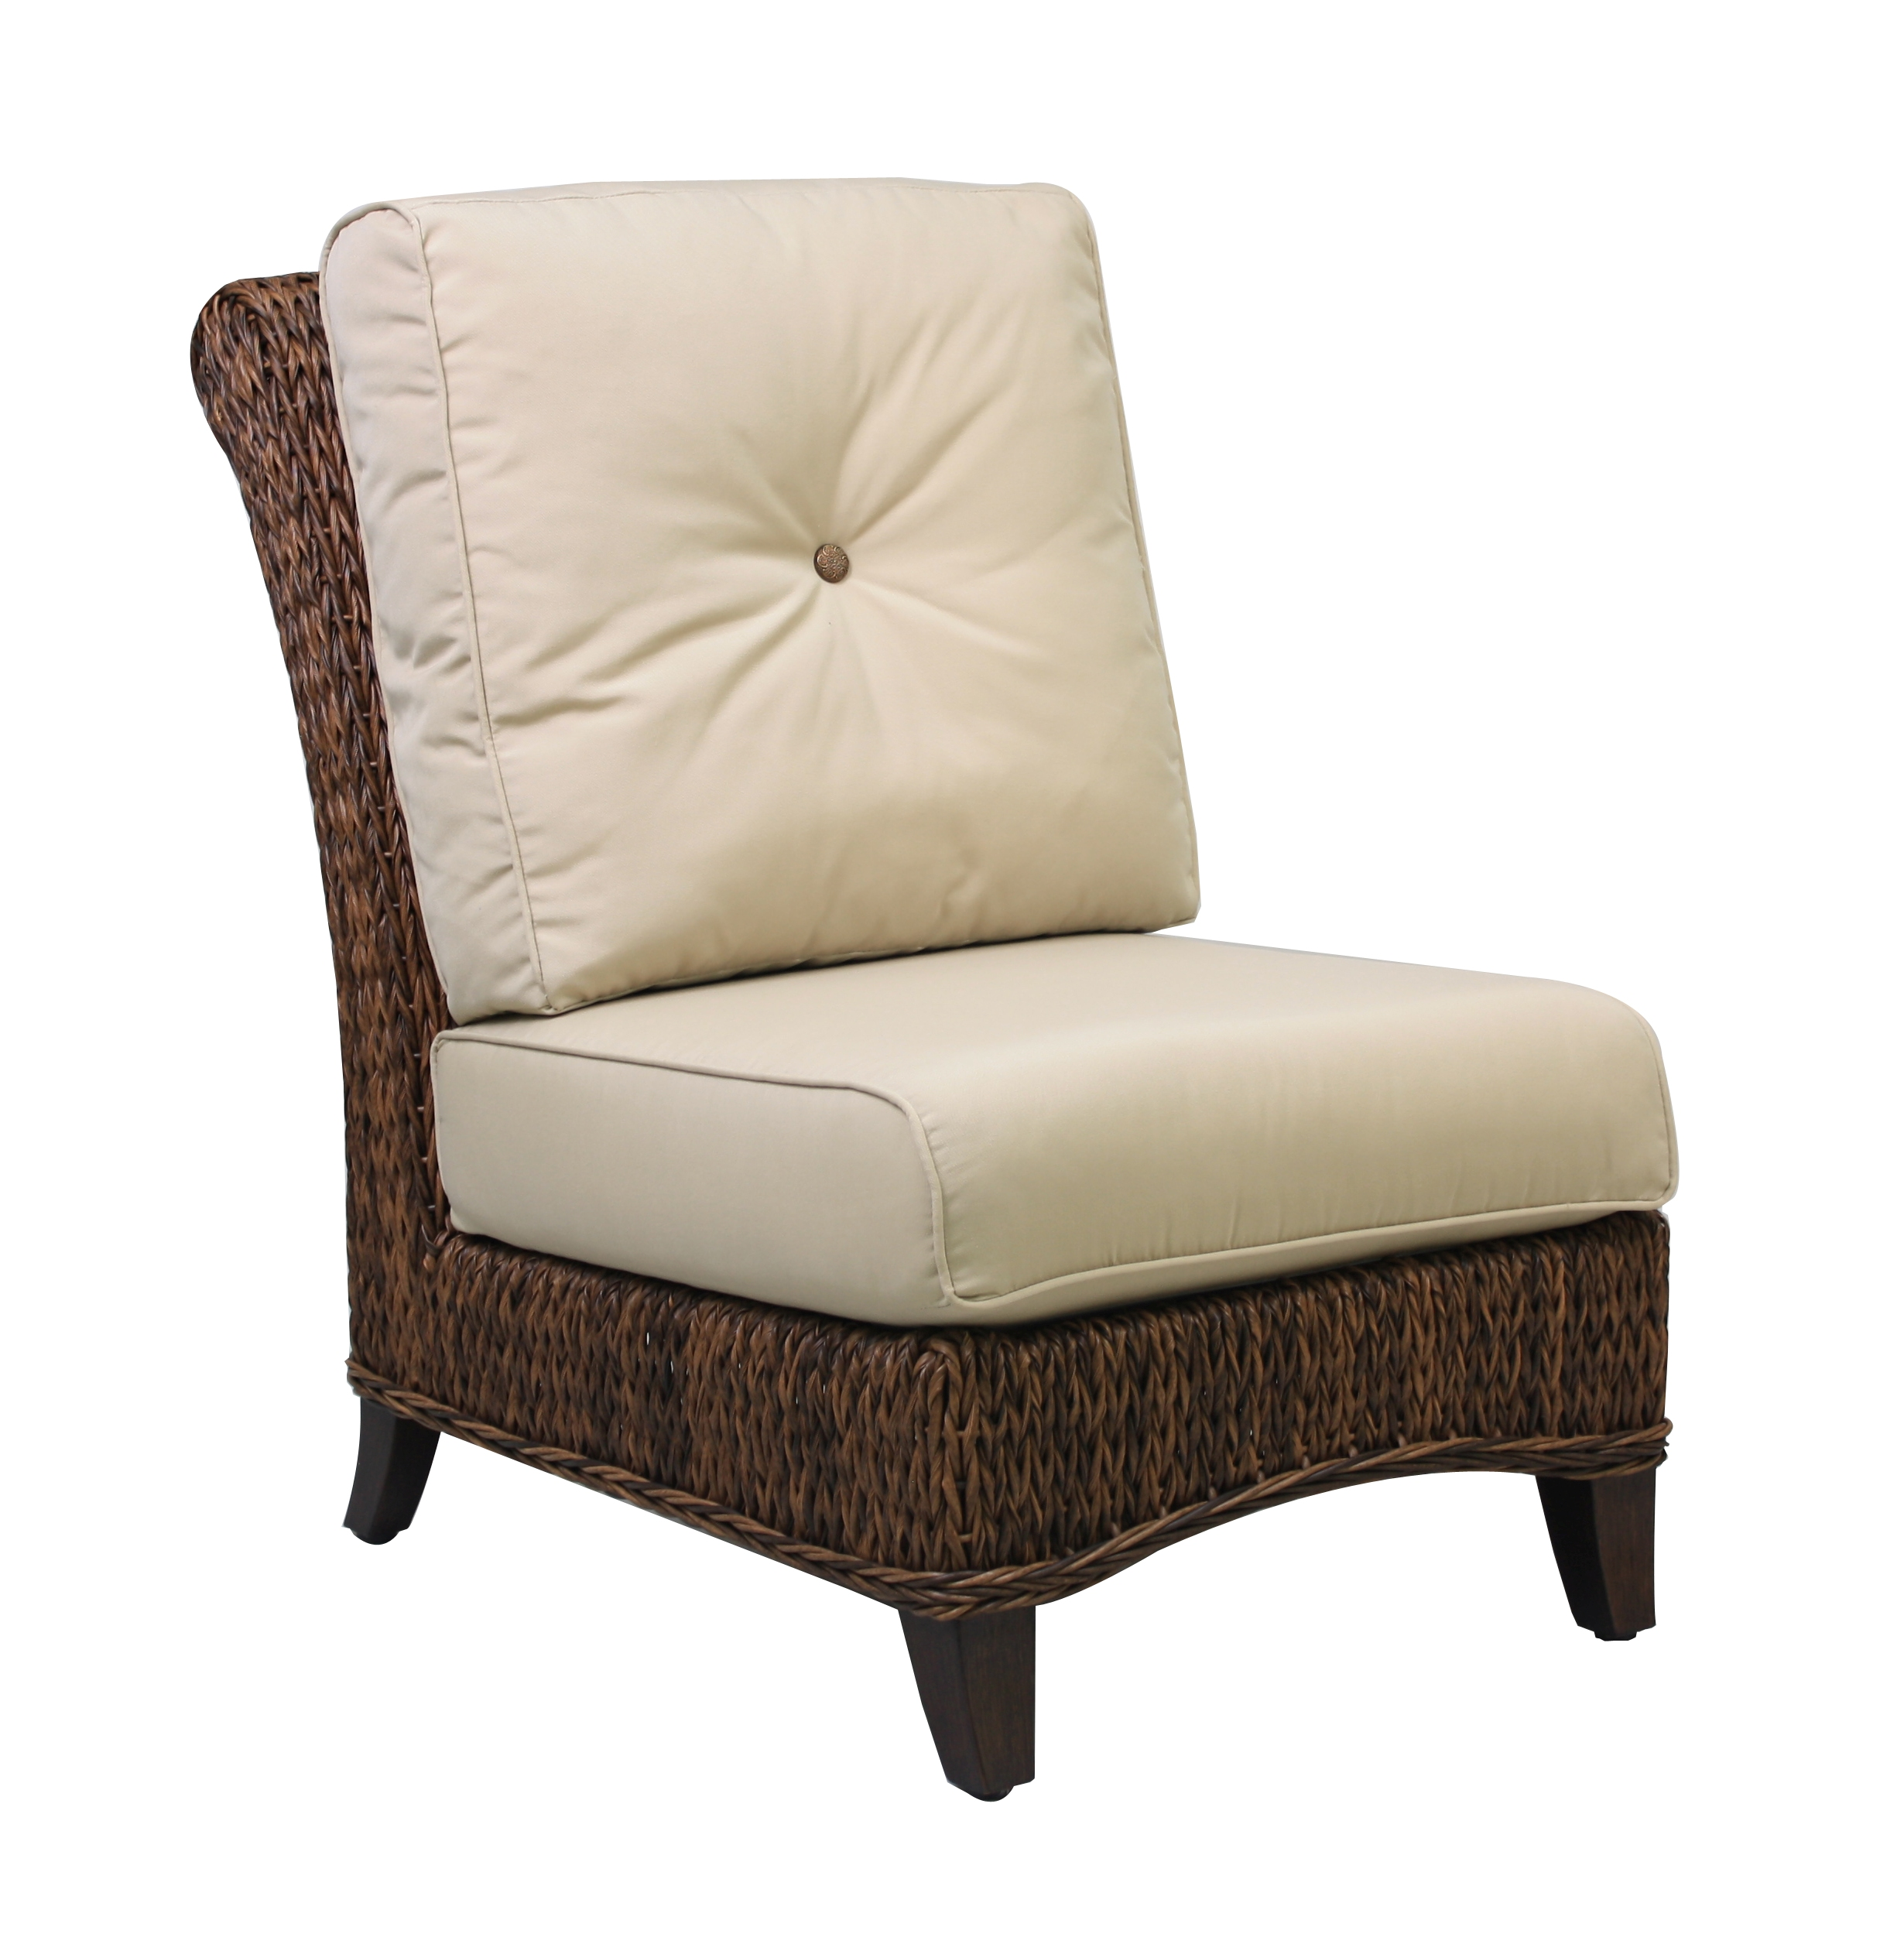 "973831A Antigua Armless Chair   25.9"" x 40.8"" x 38.9"""